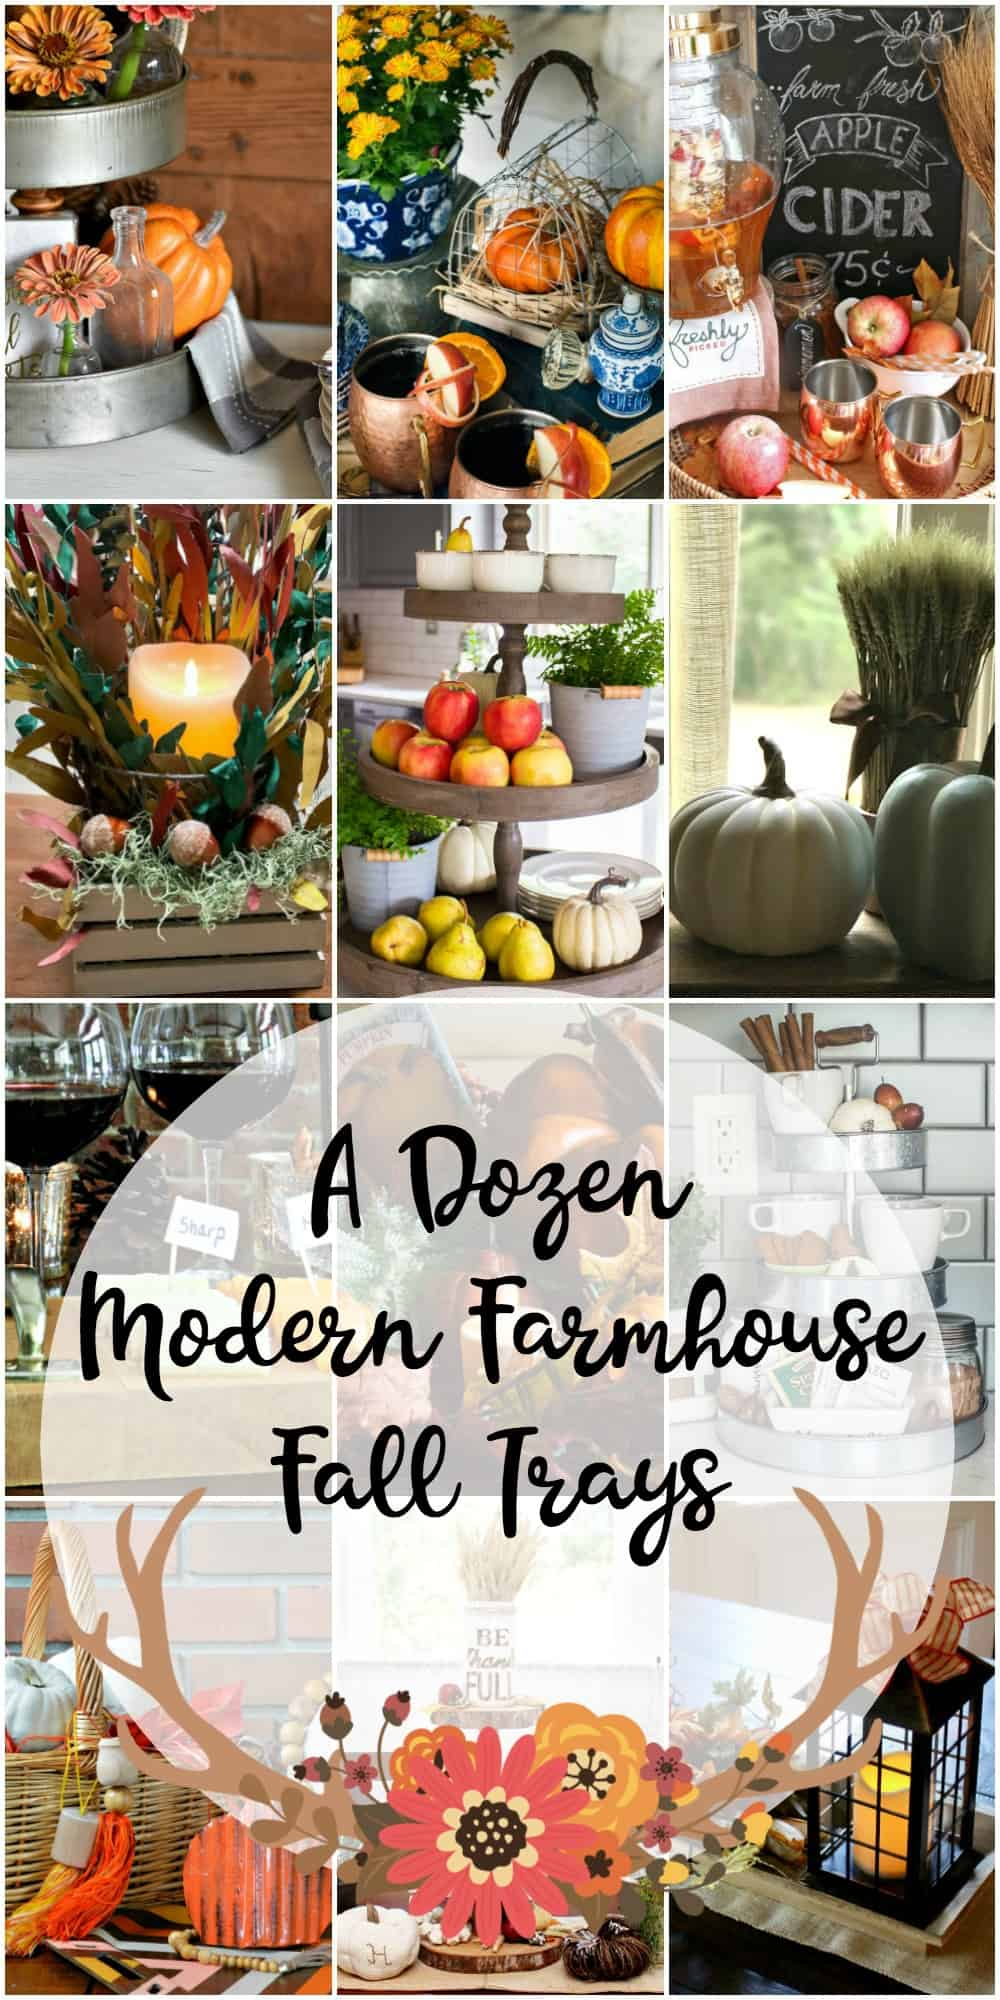 A Dozen Modern Farmhouse Trays